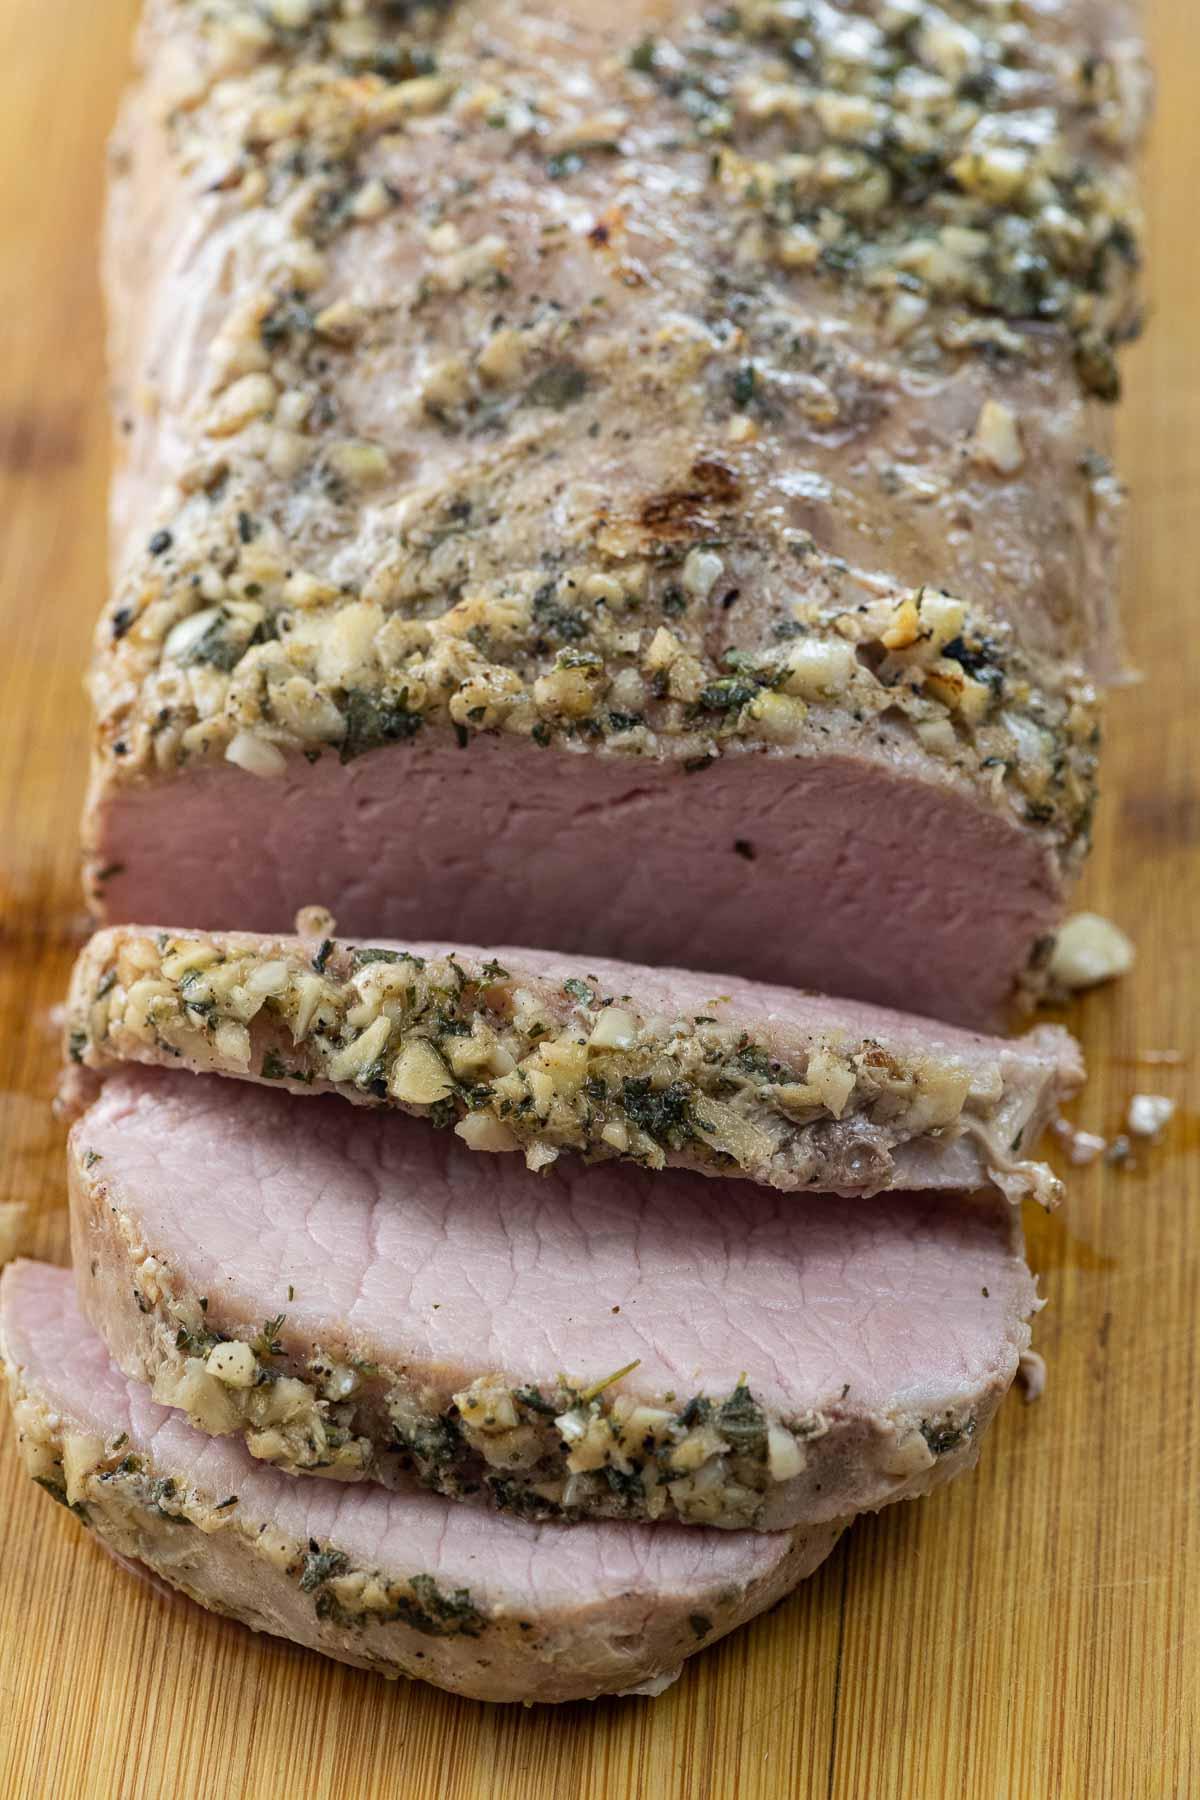 sous vide pork roast on a carving board